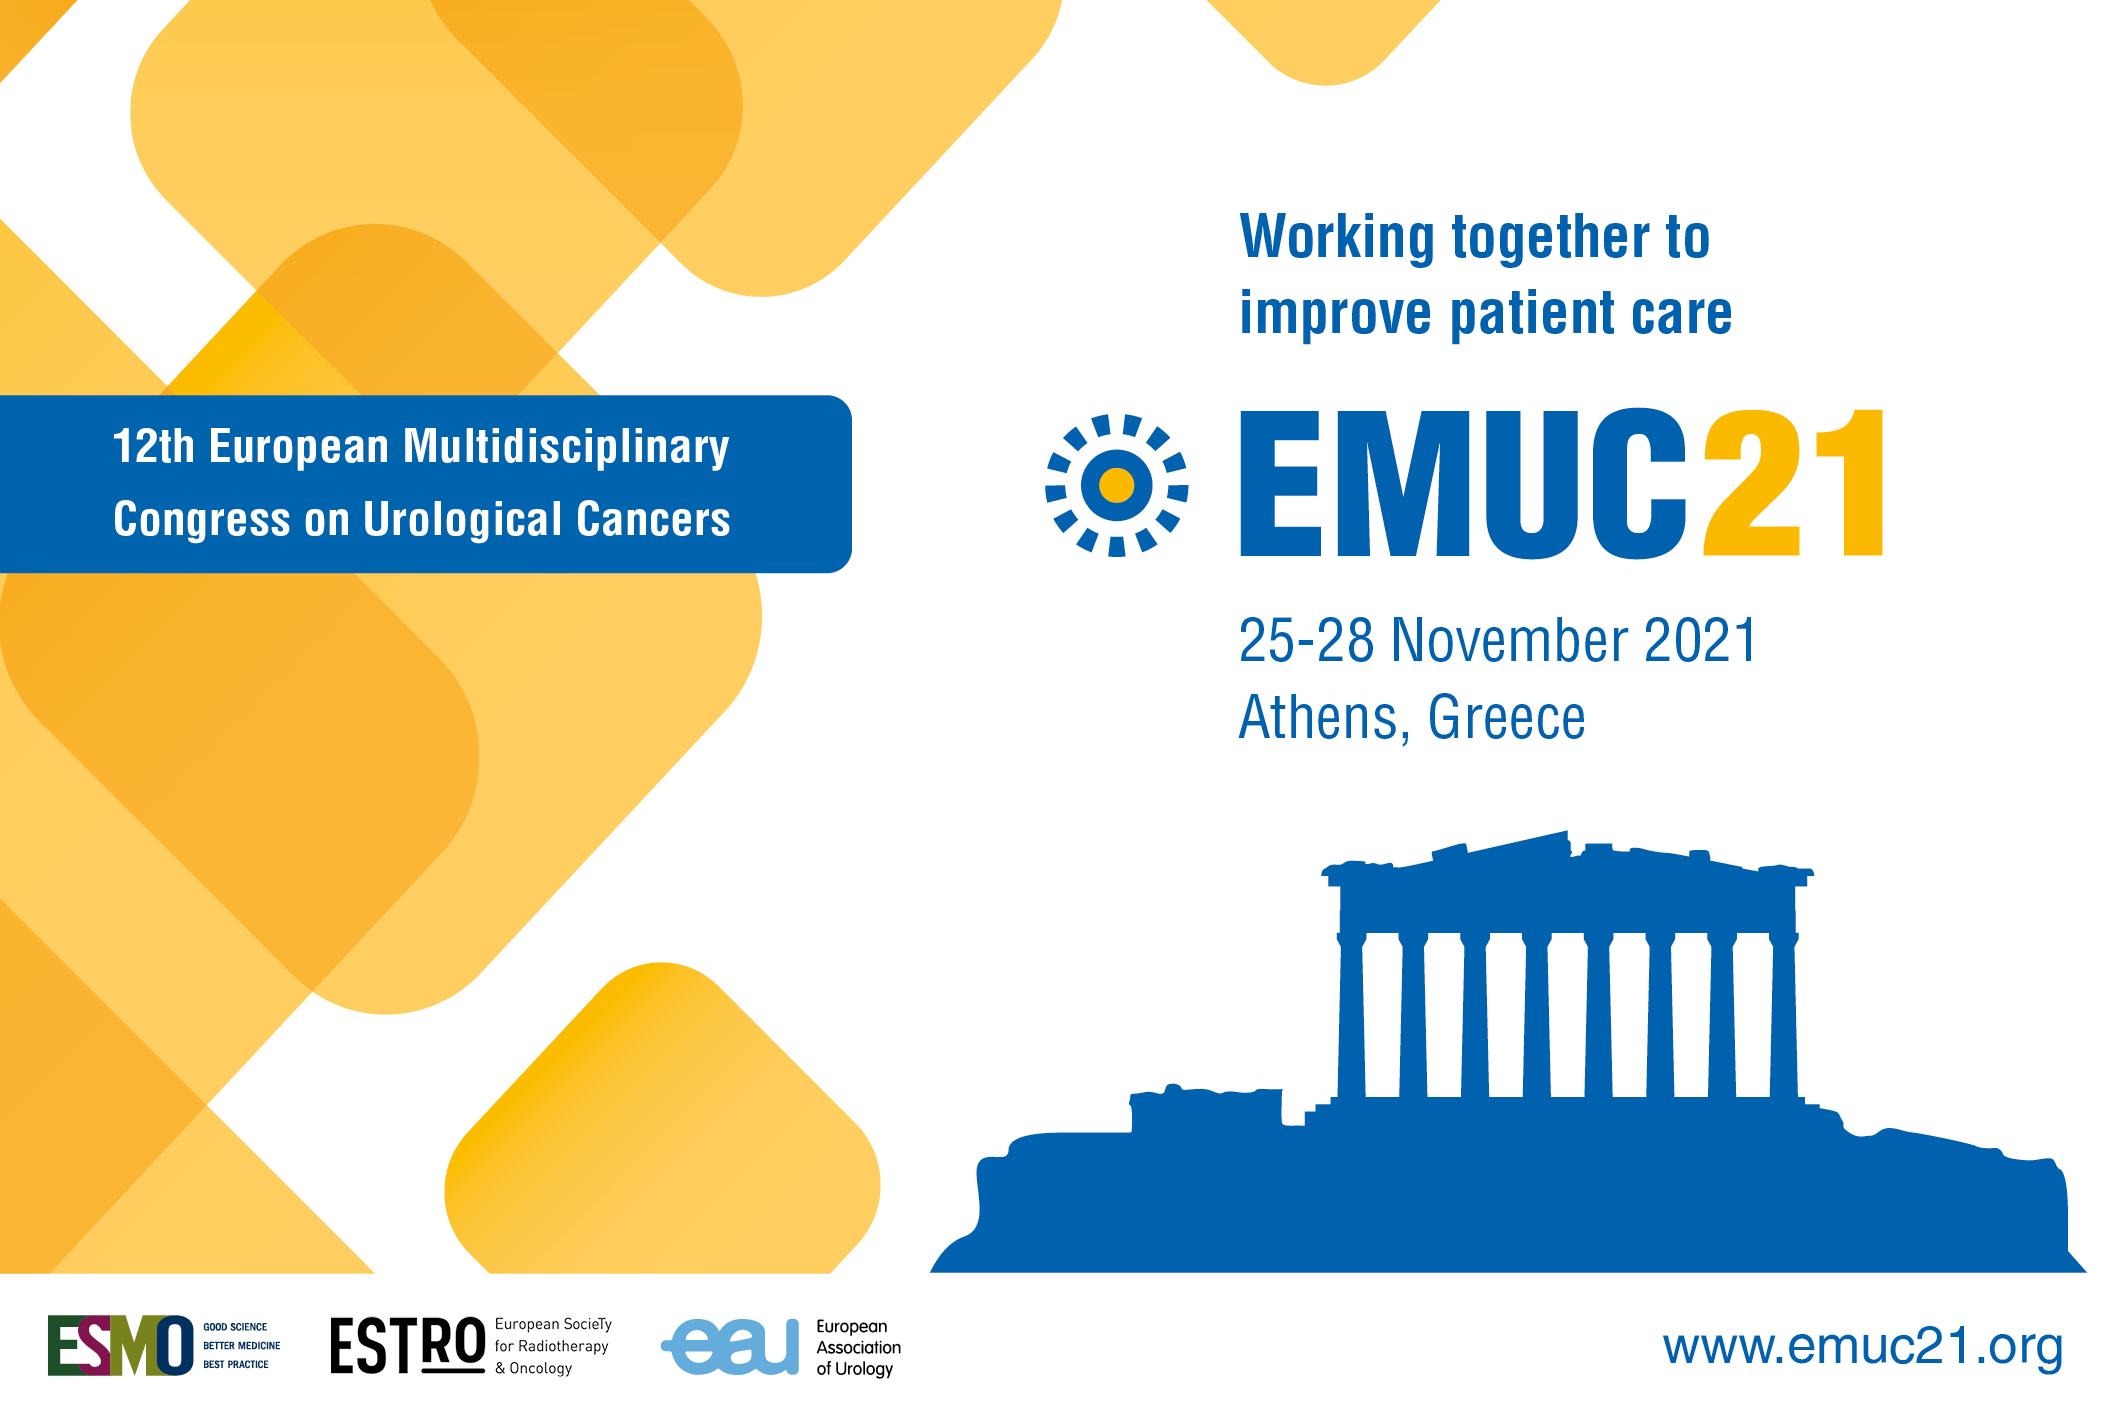 13th European Multidisciplinary Congress on Urological Cancers (EMUC21)